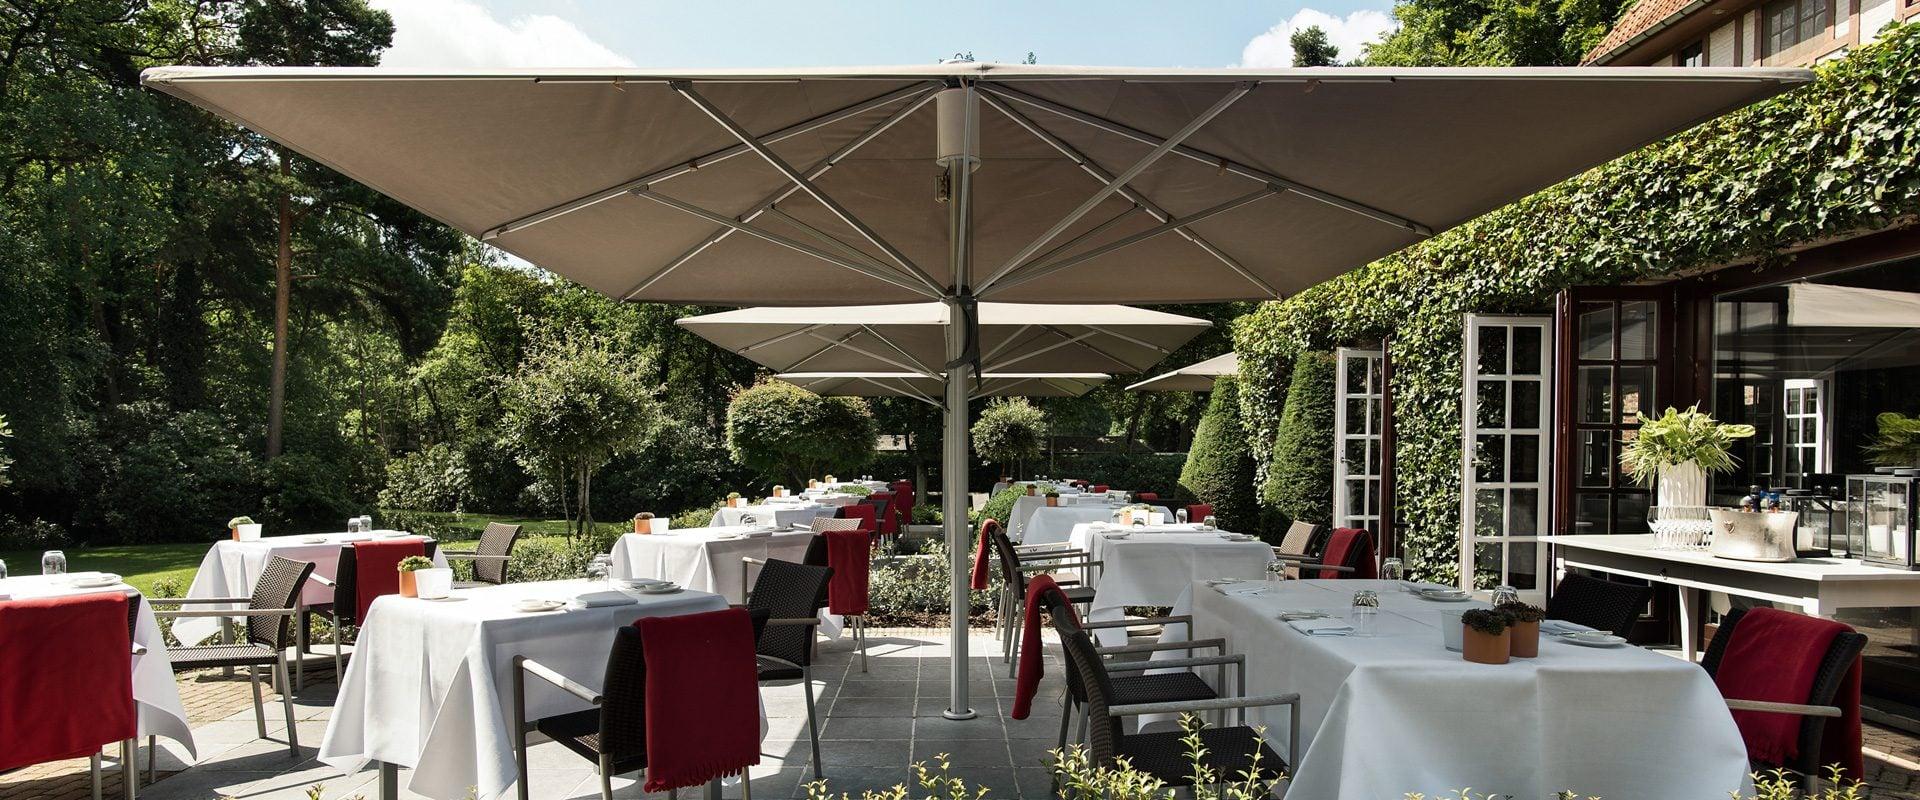 Terrasse Restaurant Ralf Berendsen - Domaine La Butte aux Bois